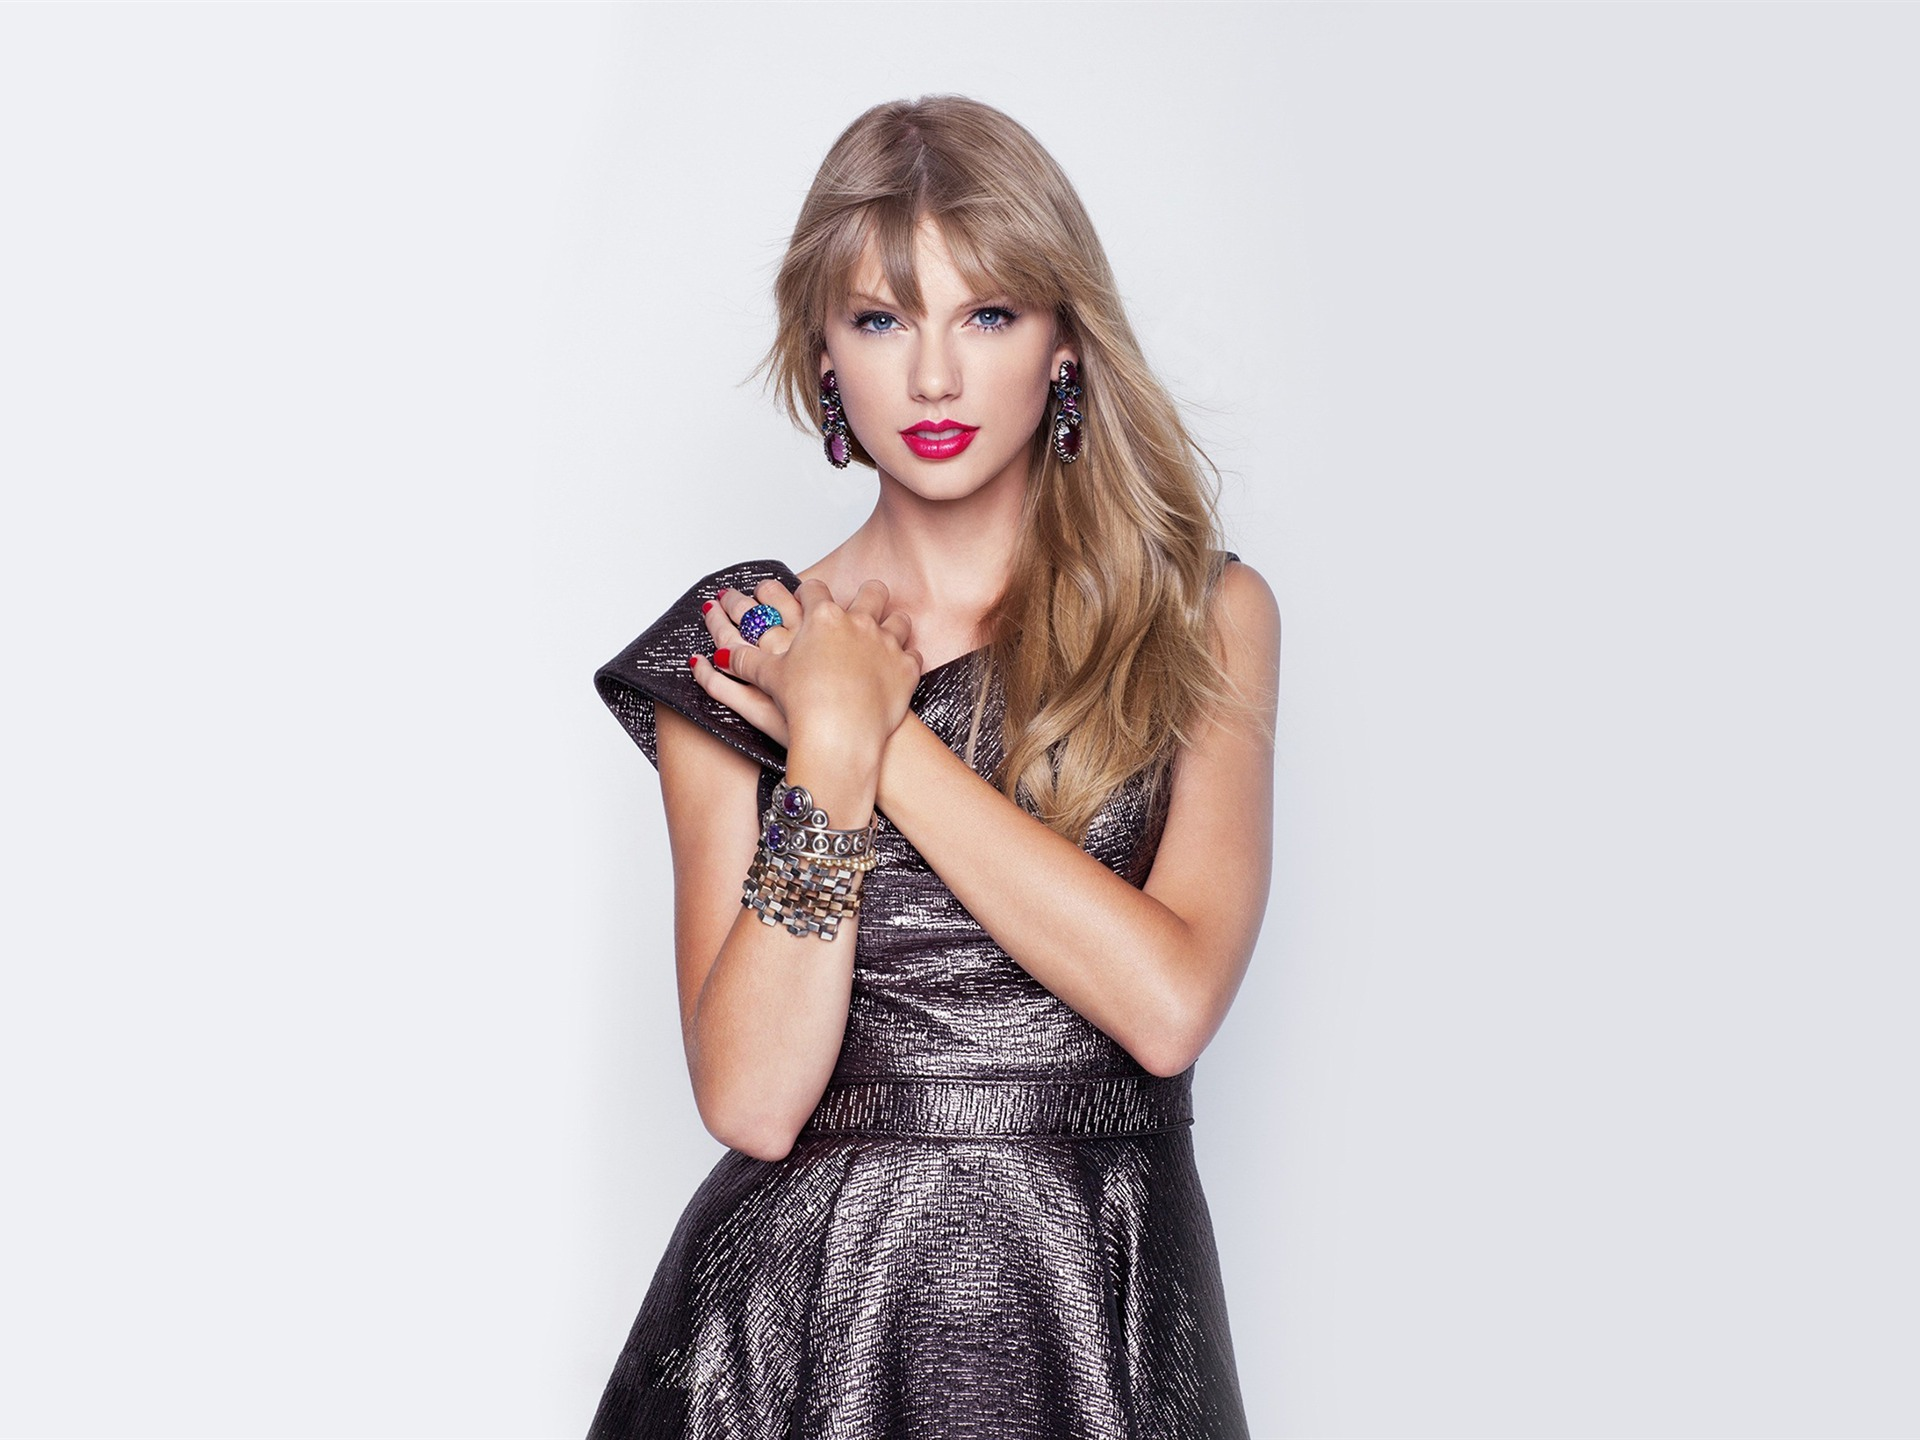 2016 Taylor Swift Beauty Chanteur HD Photo Fonds D'écran